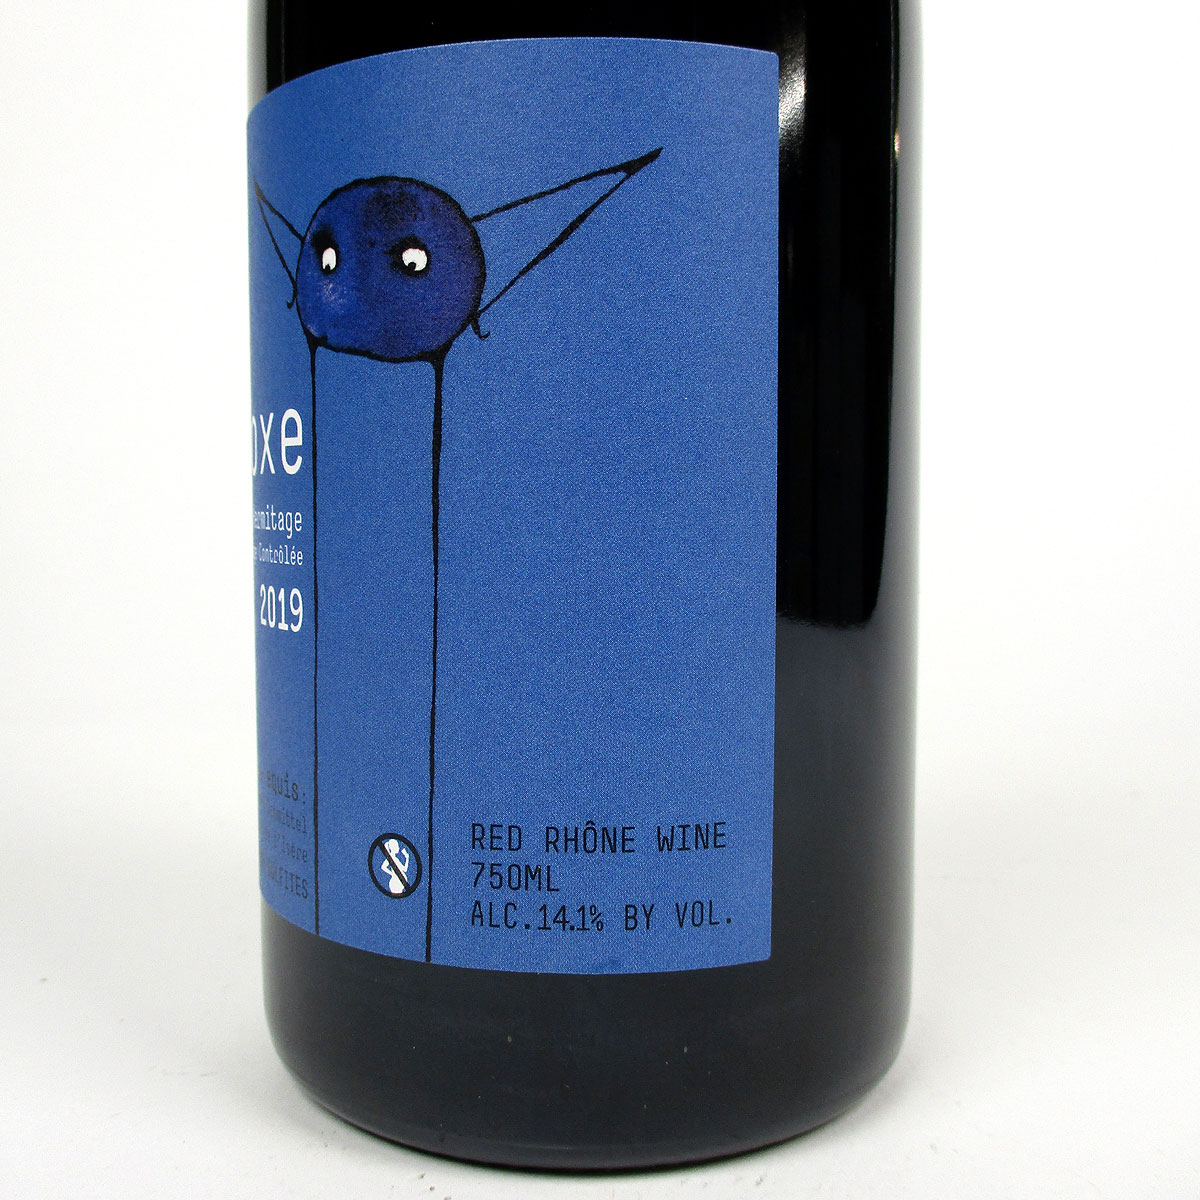 Crozes Hermitage: Domaine Equis 'Equinoxe' 2019 - Bottle Side Label